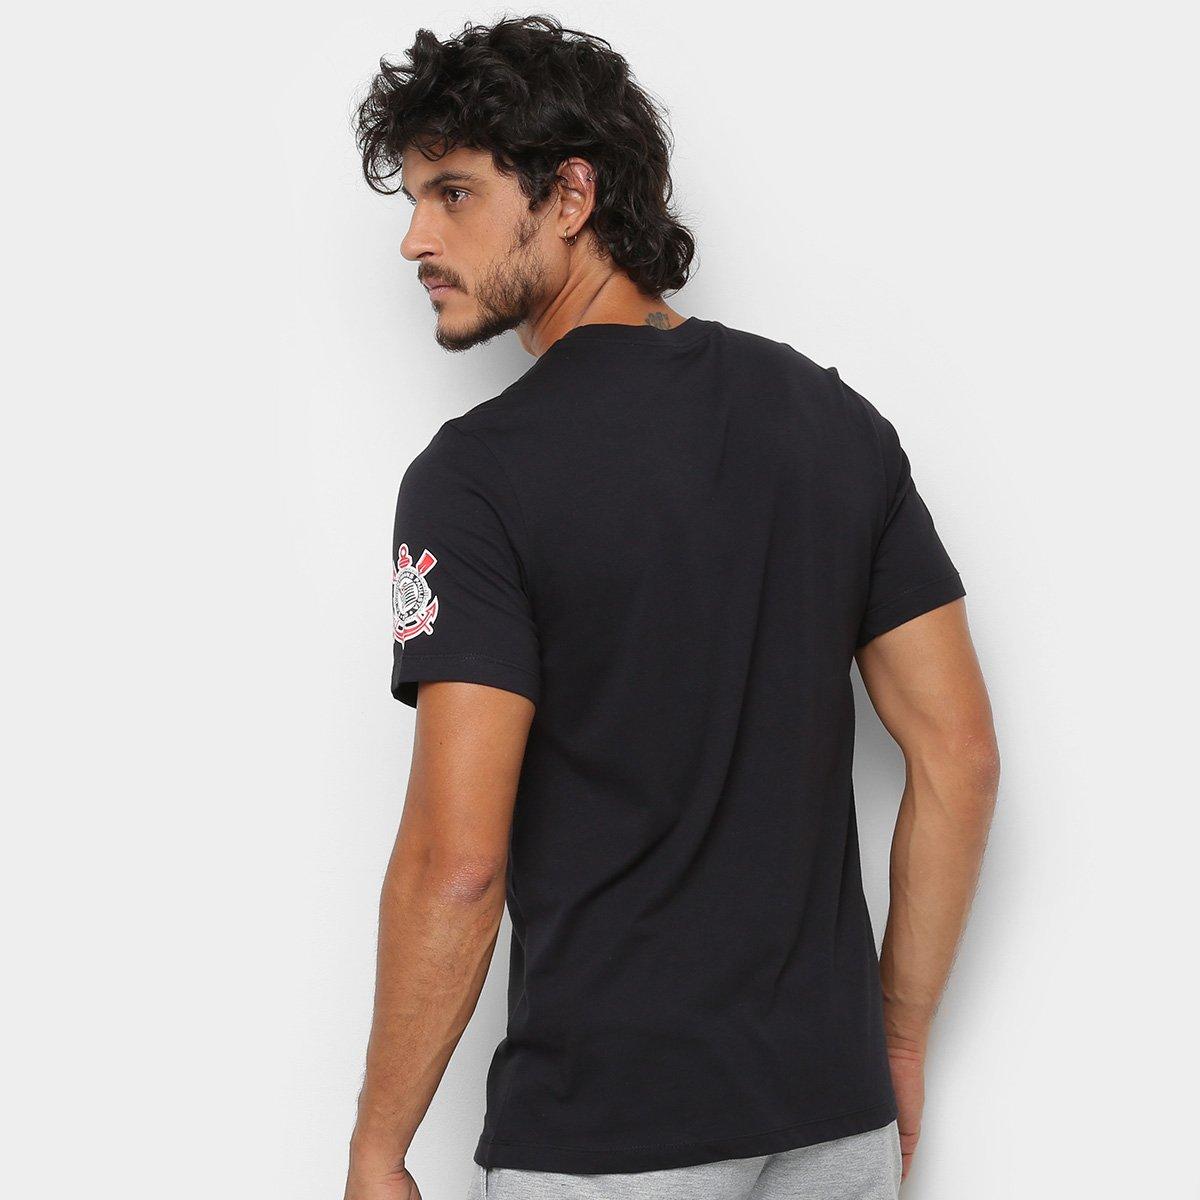 7c4f759fe8 Camiseta Corinthians Nike Large Swoosh Masculina - Preto - Compre ...